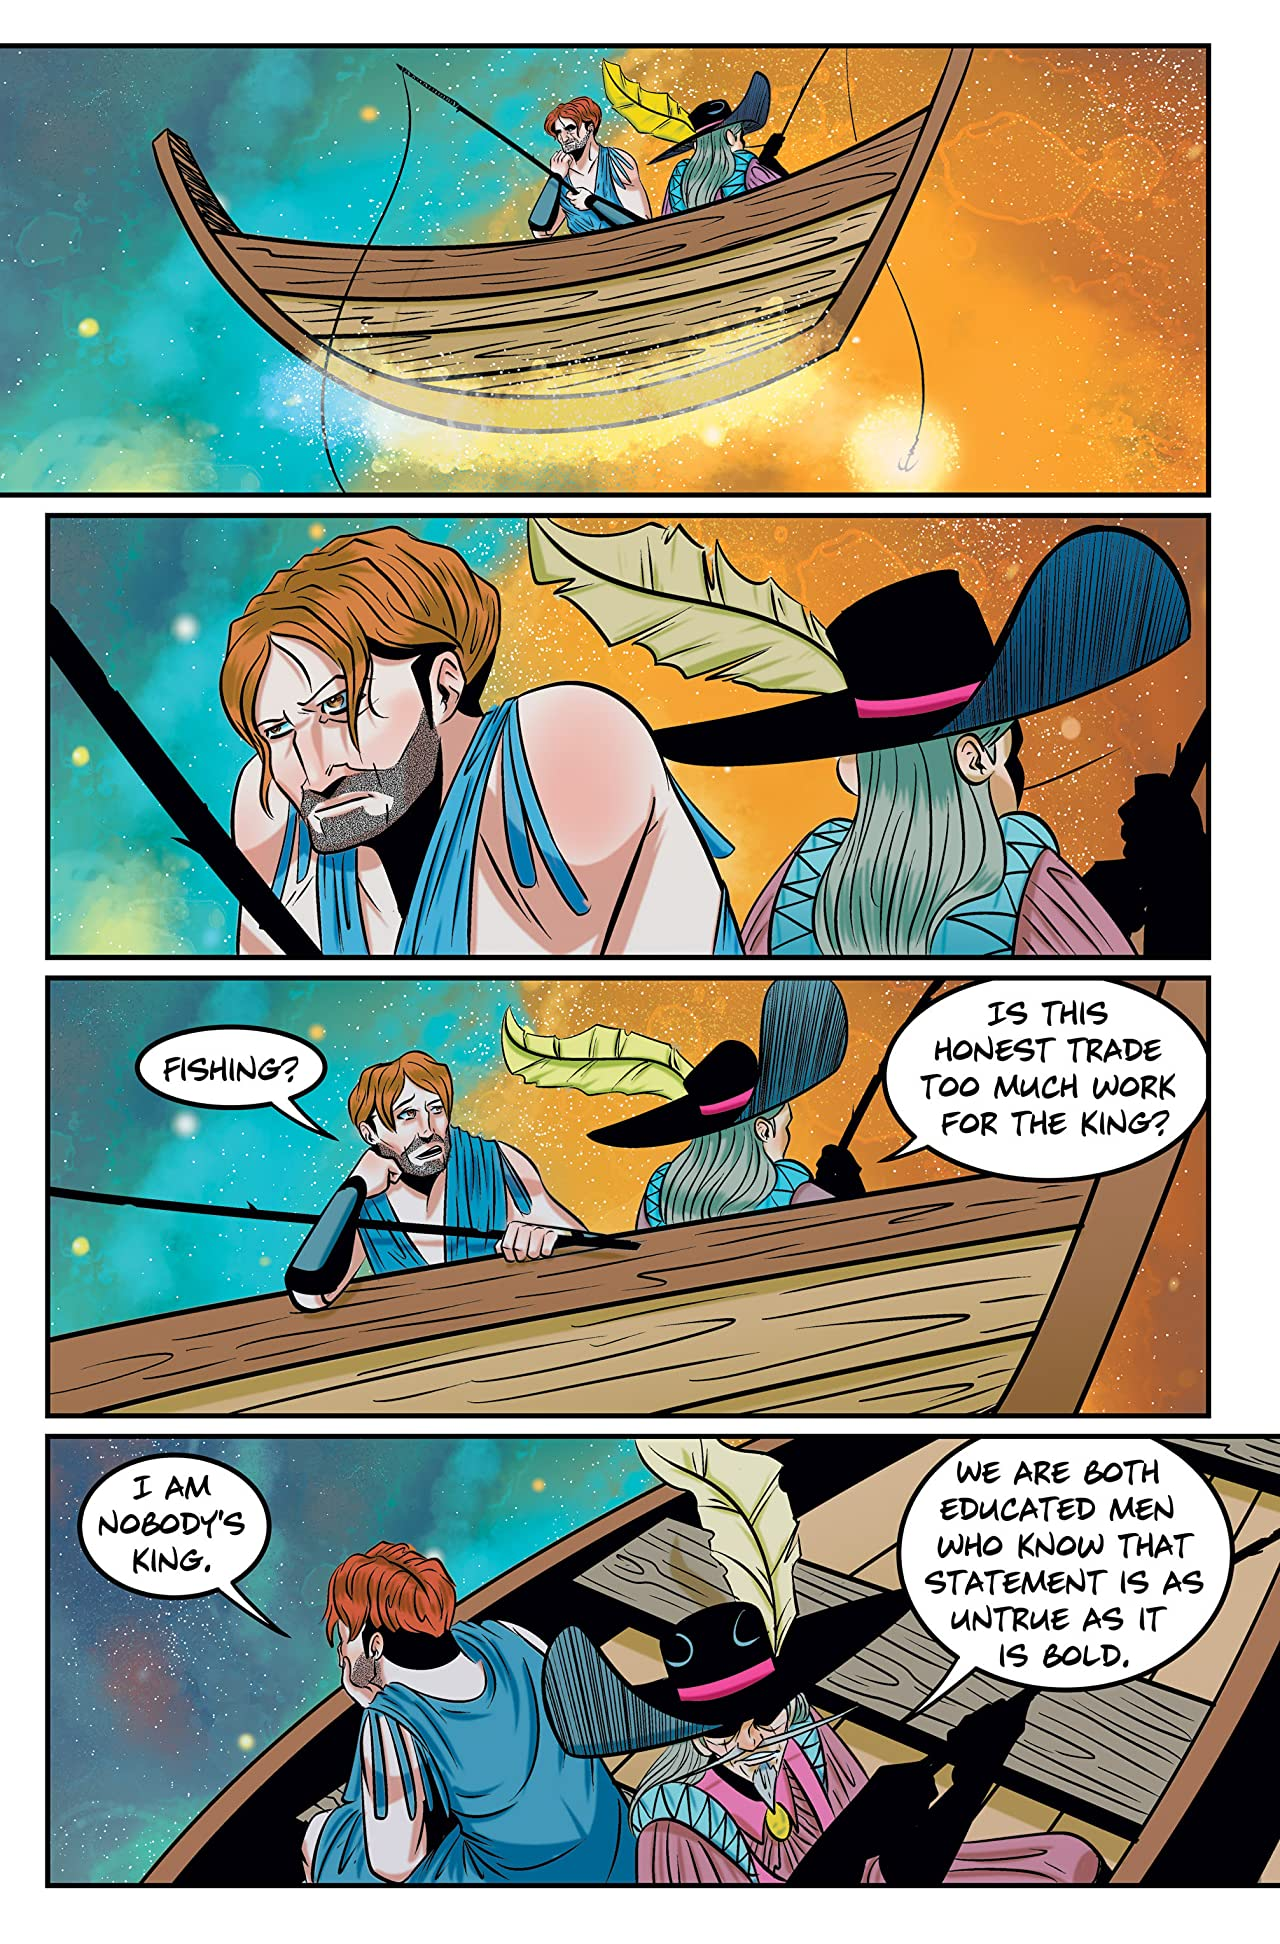 Jason and the Argonauts: Final Chorus #3